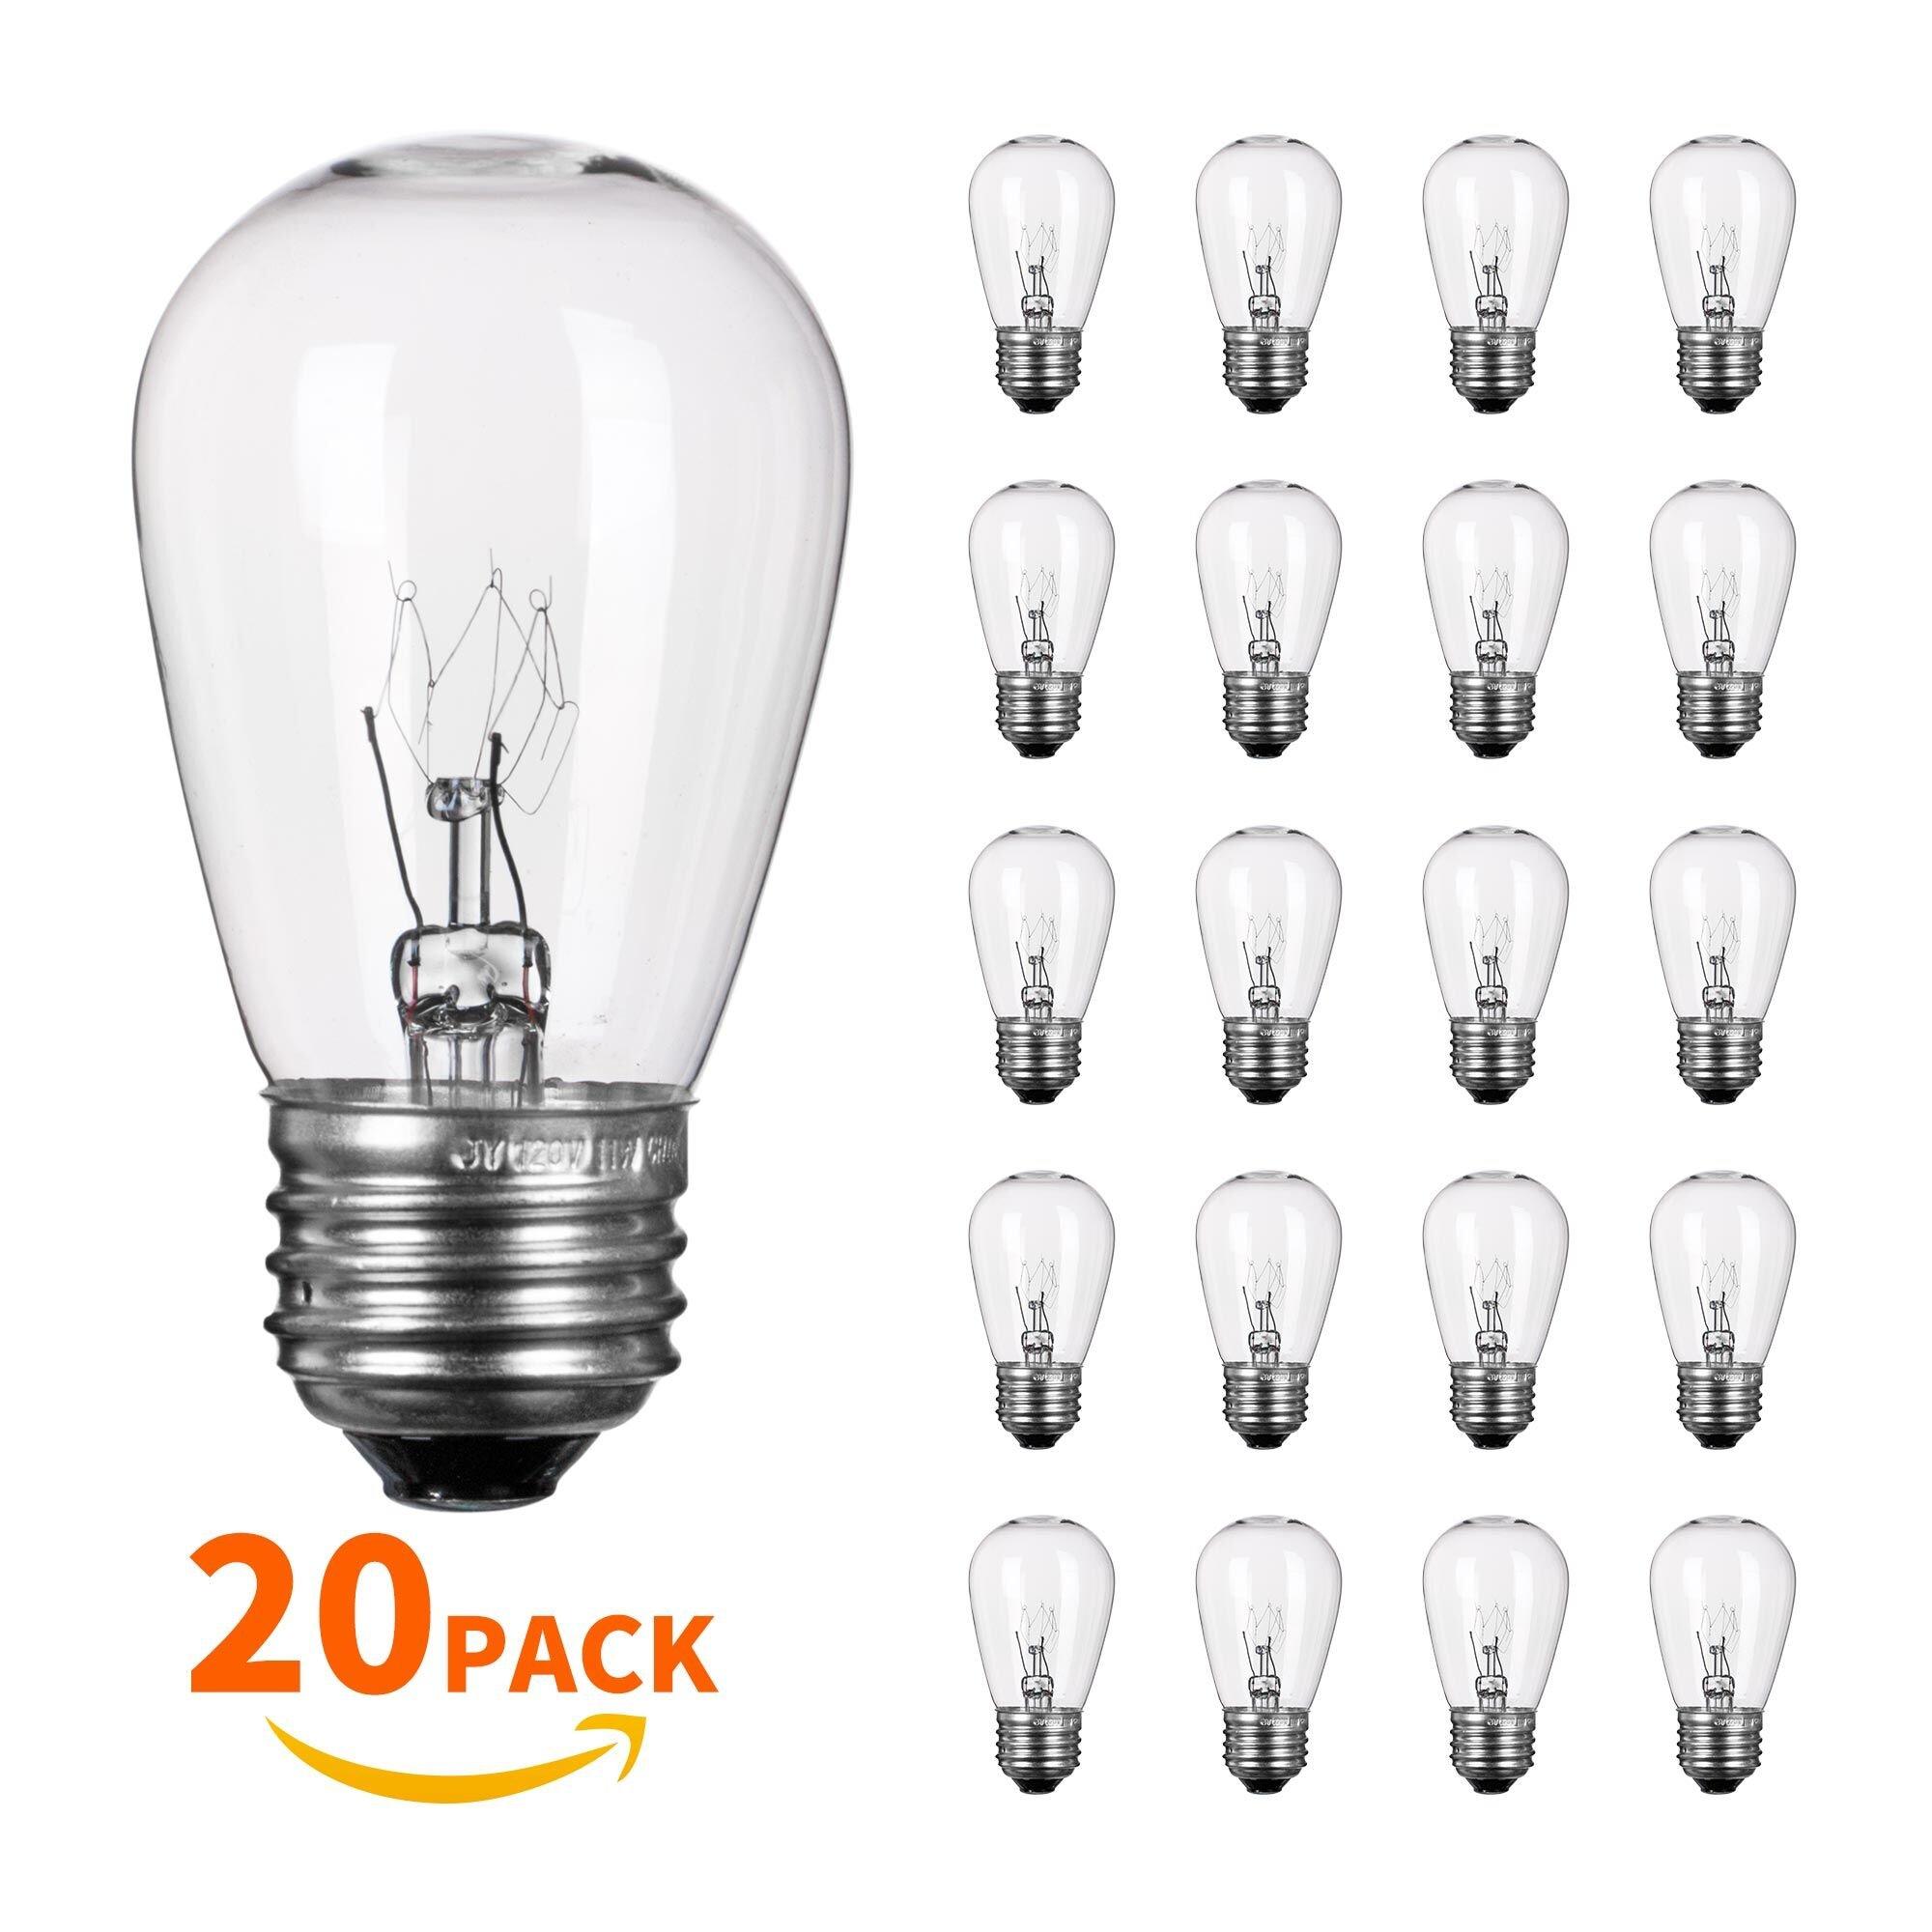 20 Pack S14 Light Bulbs 11 Watt Warm Commercial Grade